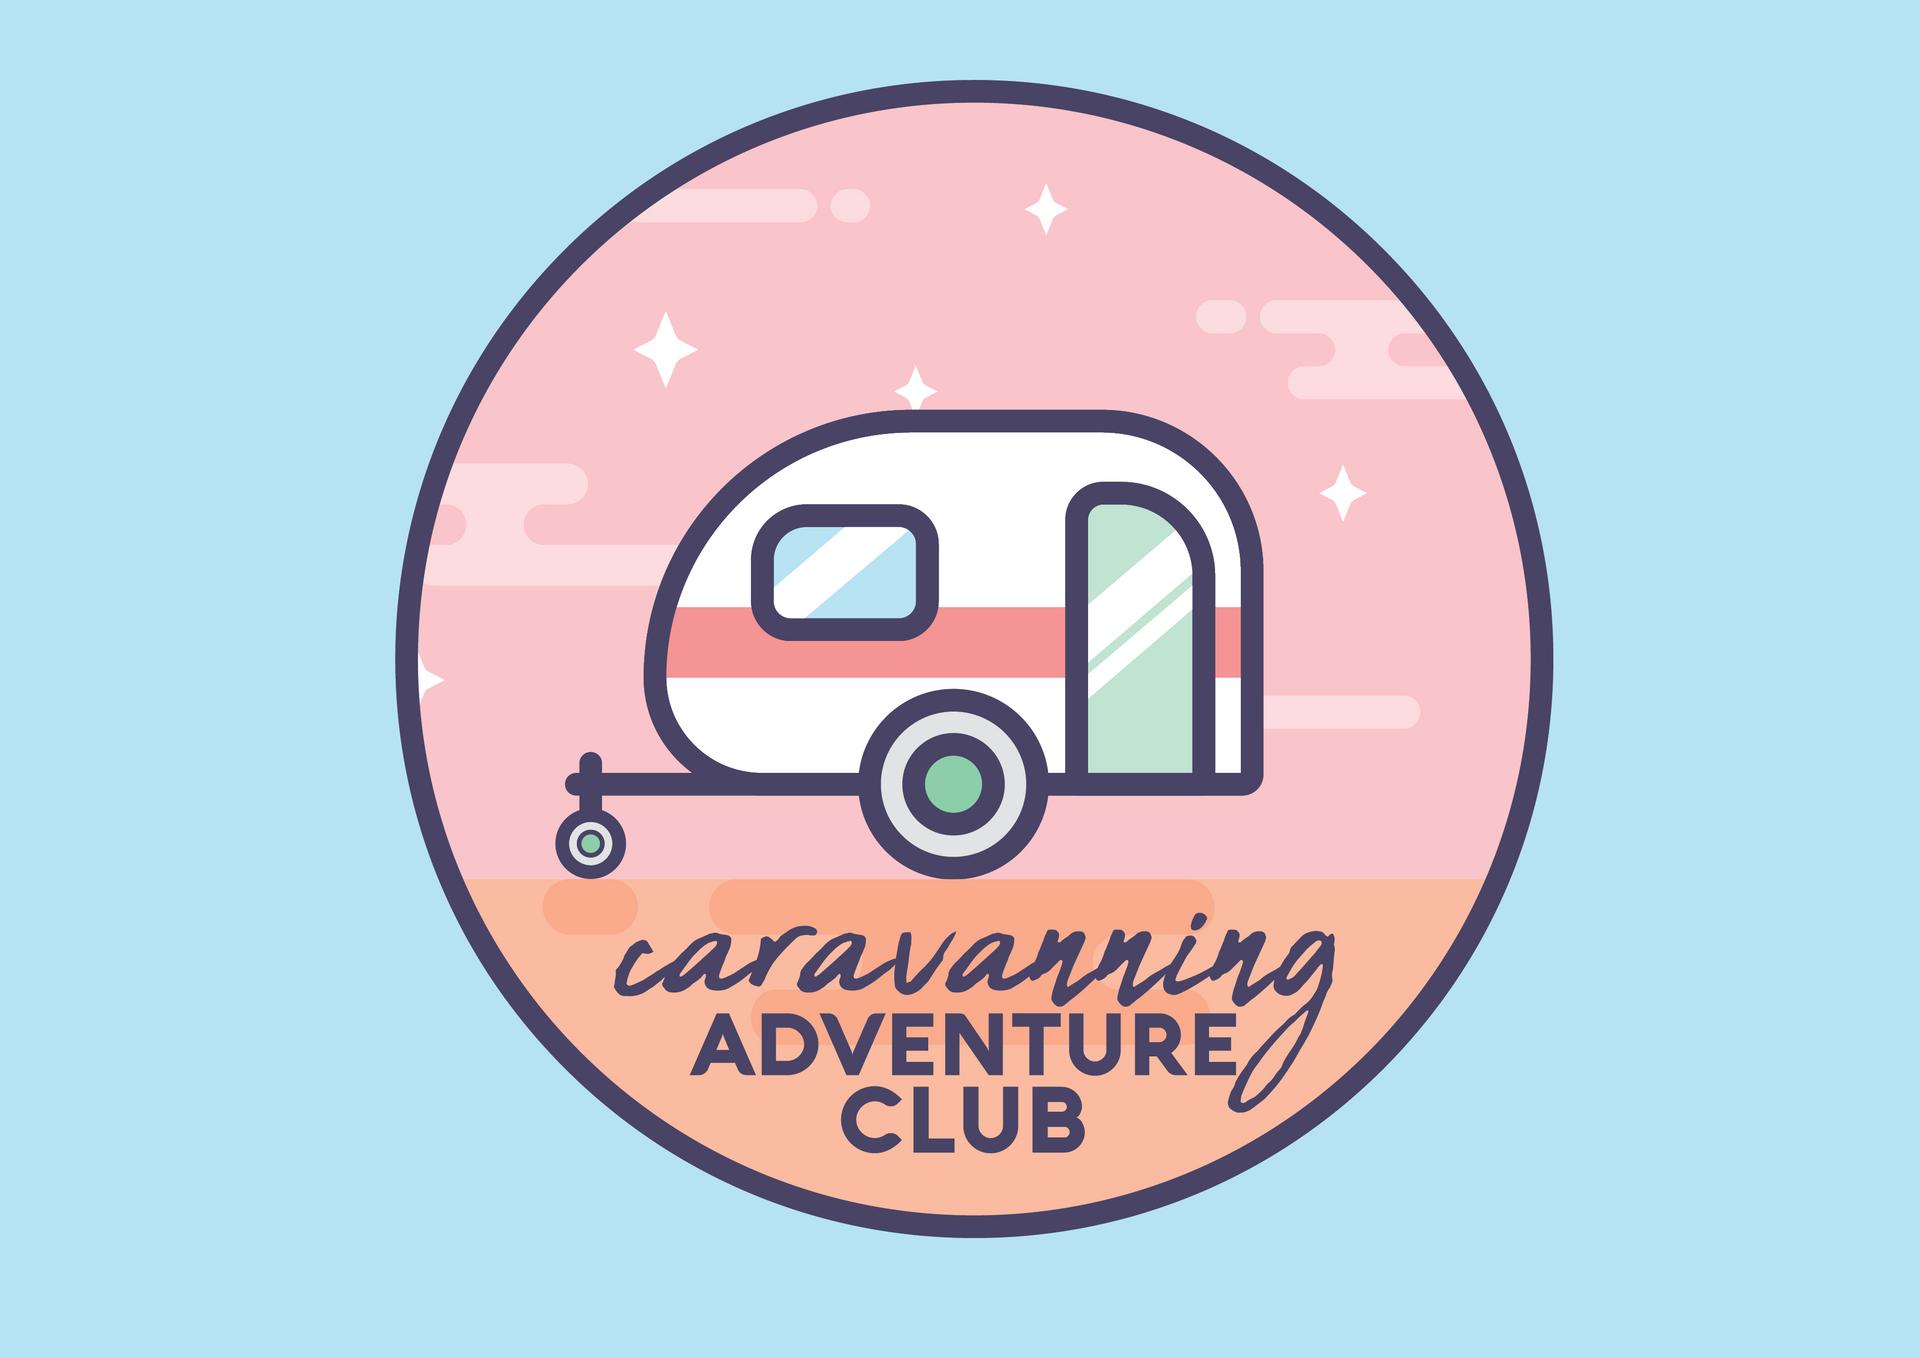 Caravanning Club